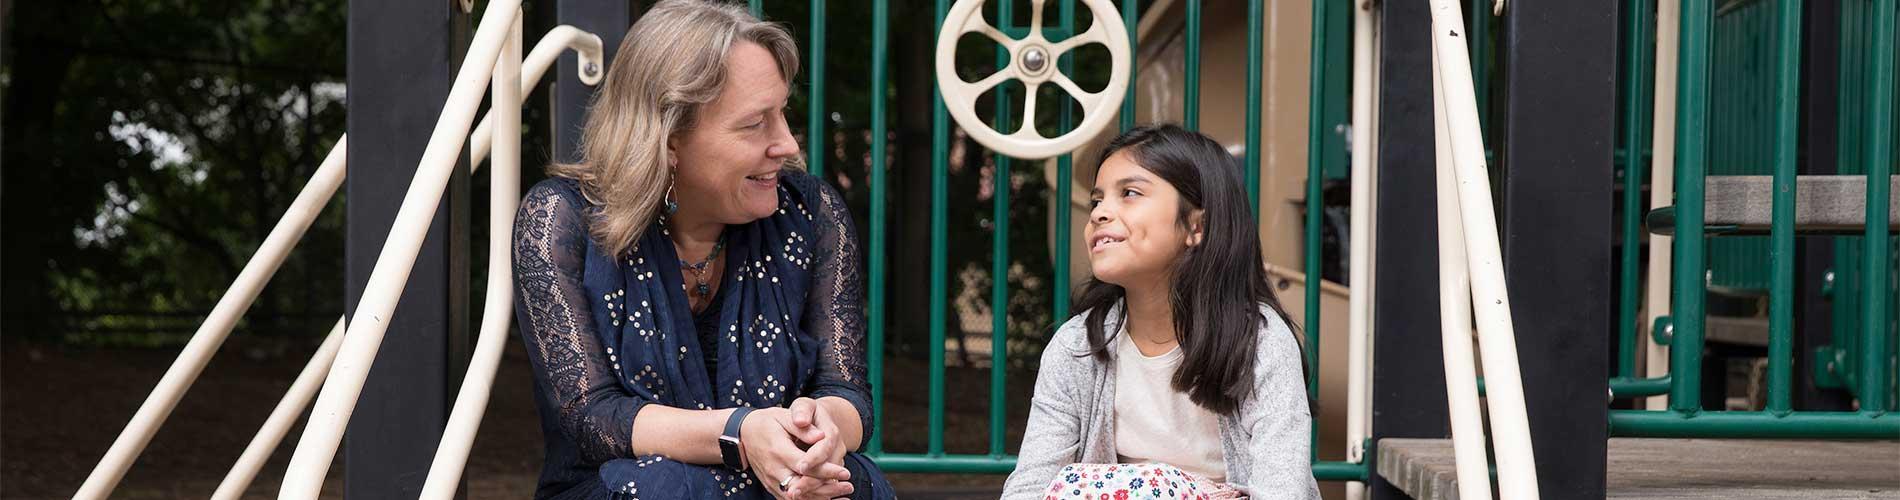 Psychiatrist talks with girl on playground